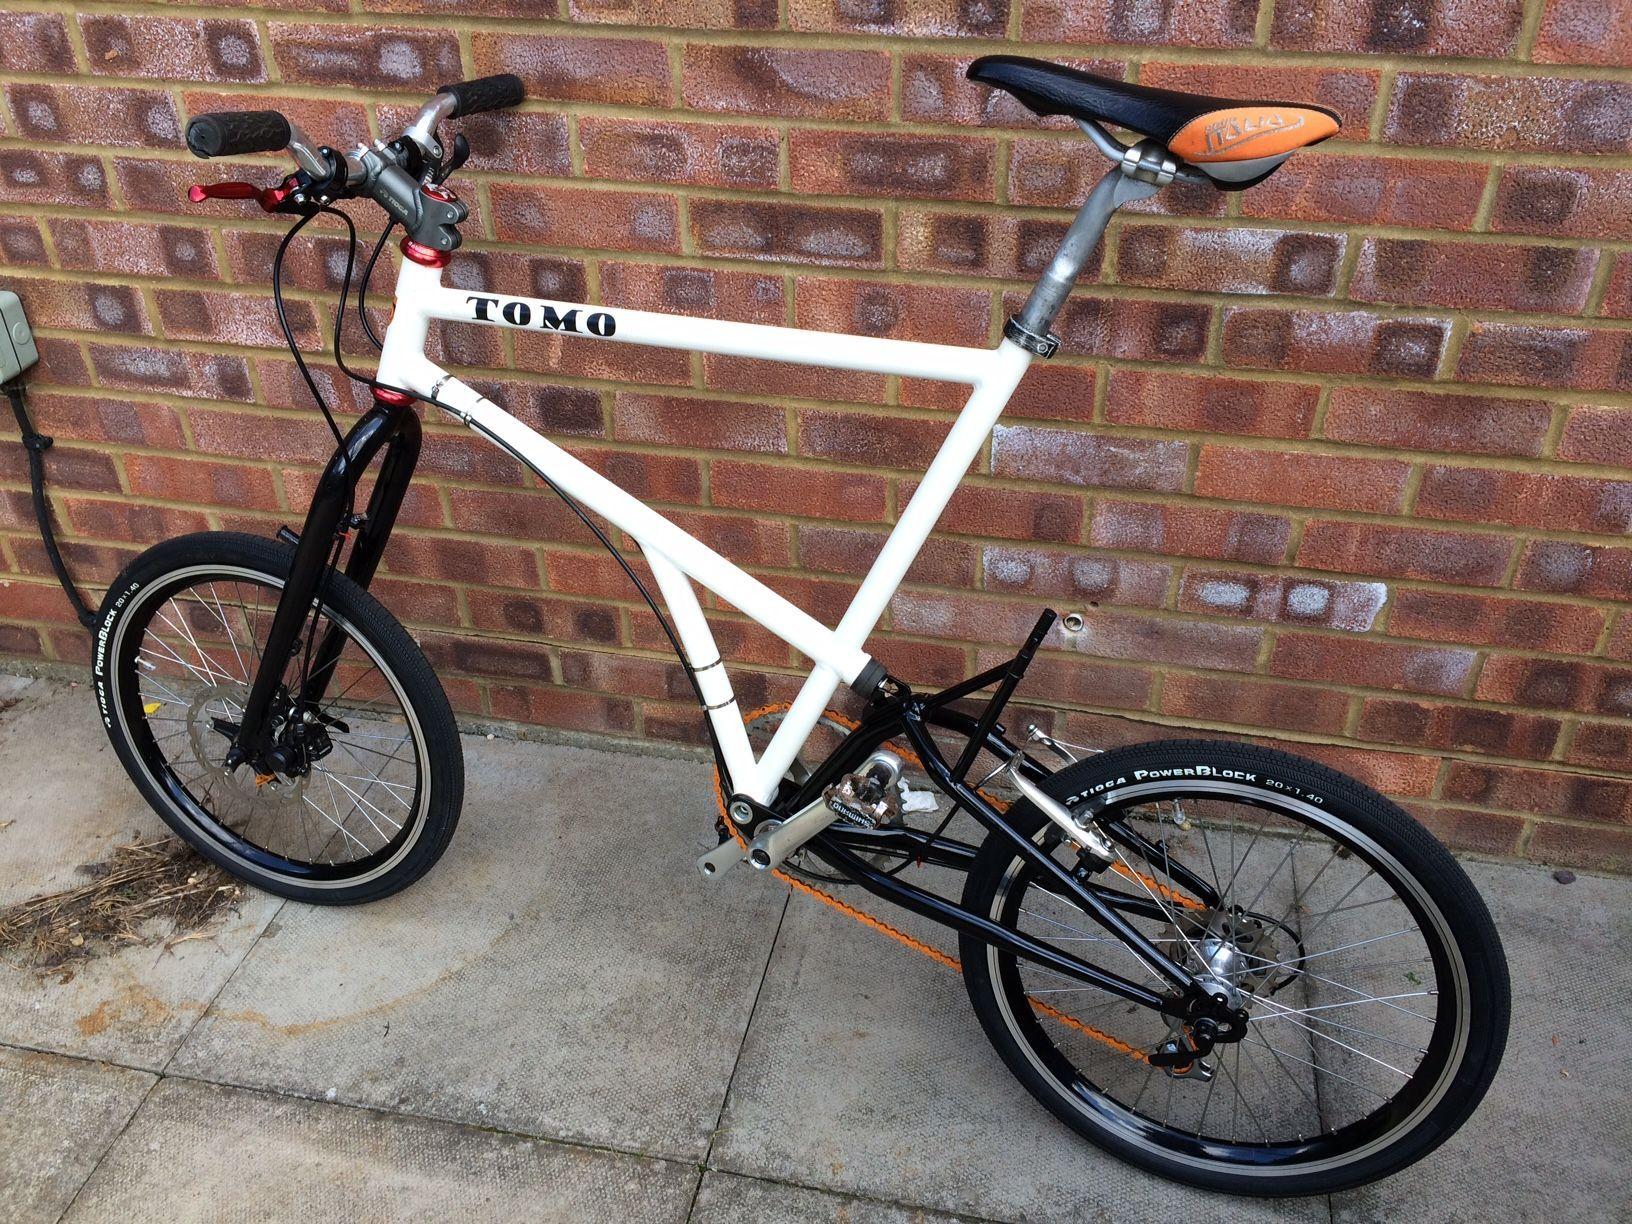 Tomo Bikes 20 Inch Wheel Folding Bike Speed Bike Bike Design